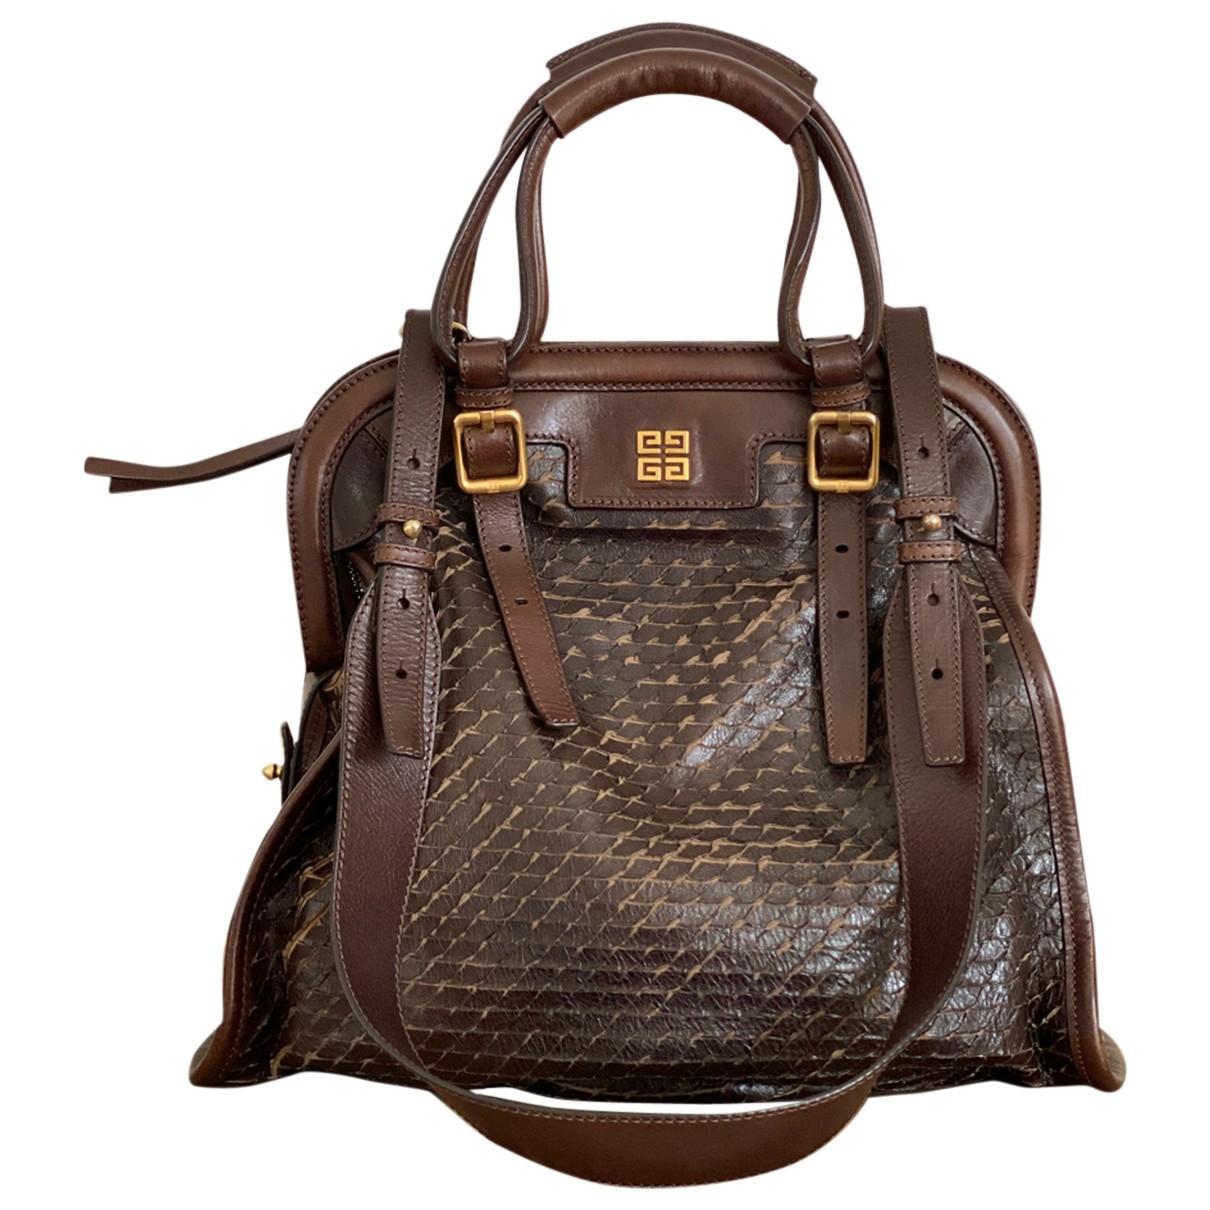 Givenchy - Sac a main   pour femme en cuir - marron